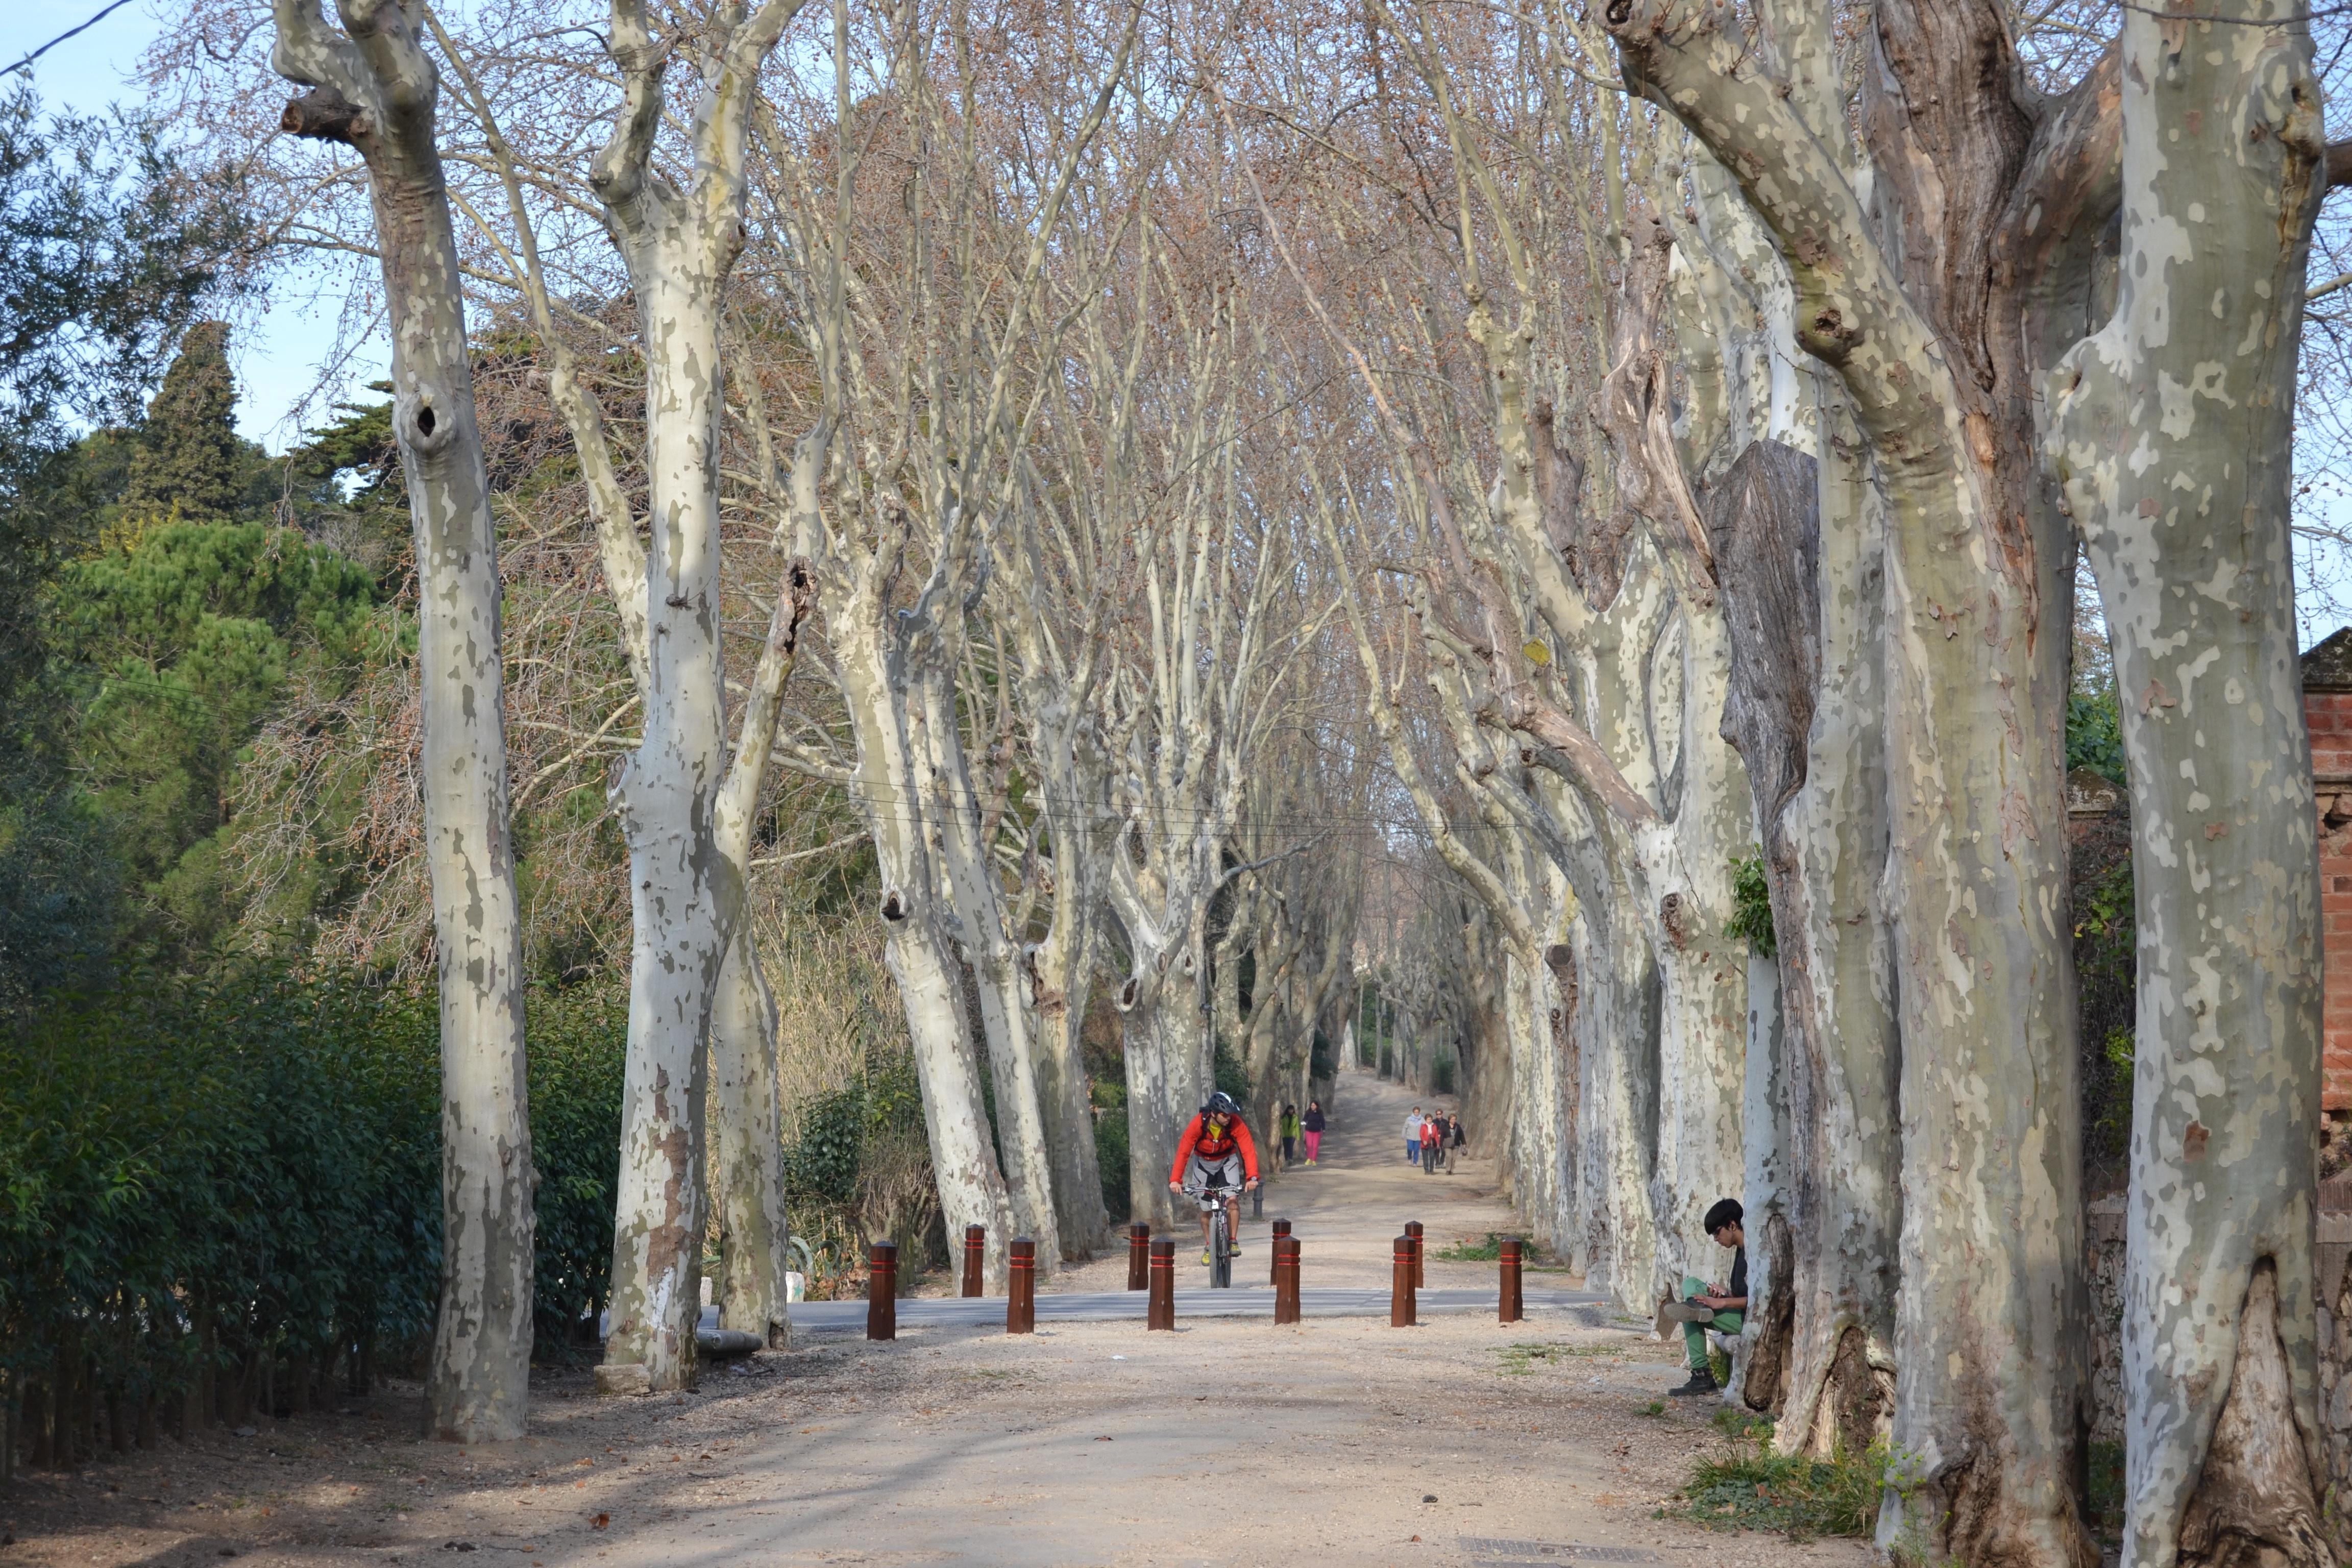 Visita al Passeig Boca de la Mina